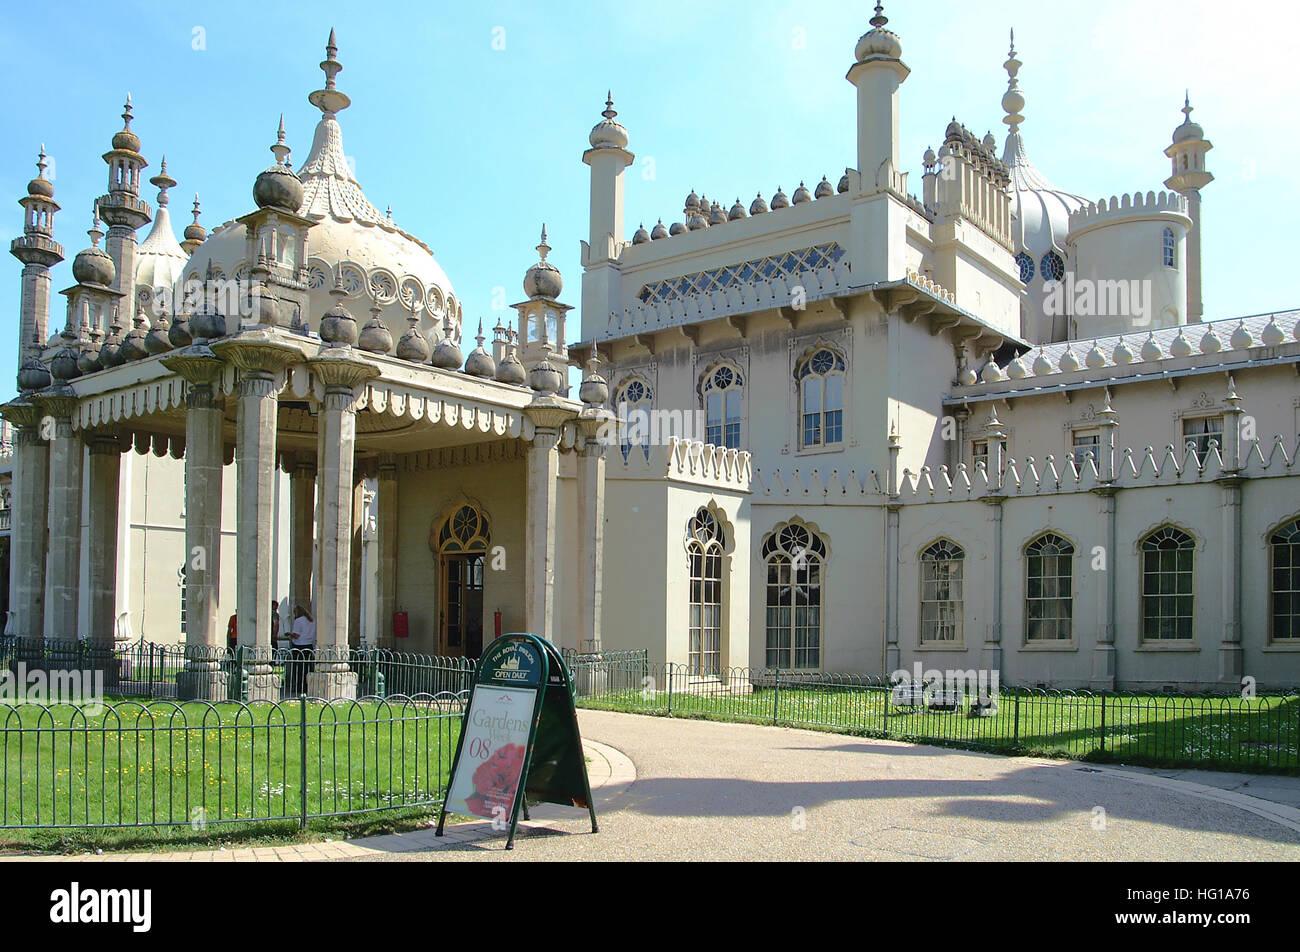 Brighton Royal Pavilion. - Stock Image